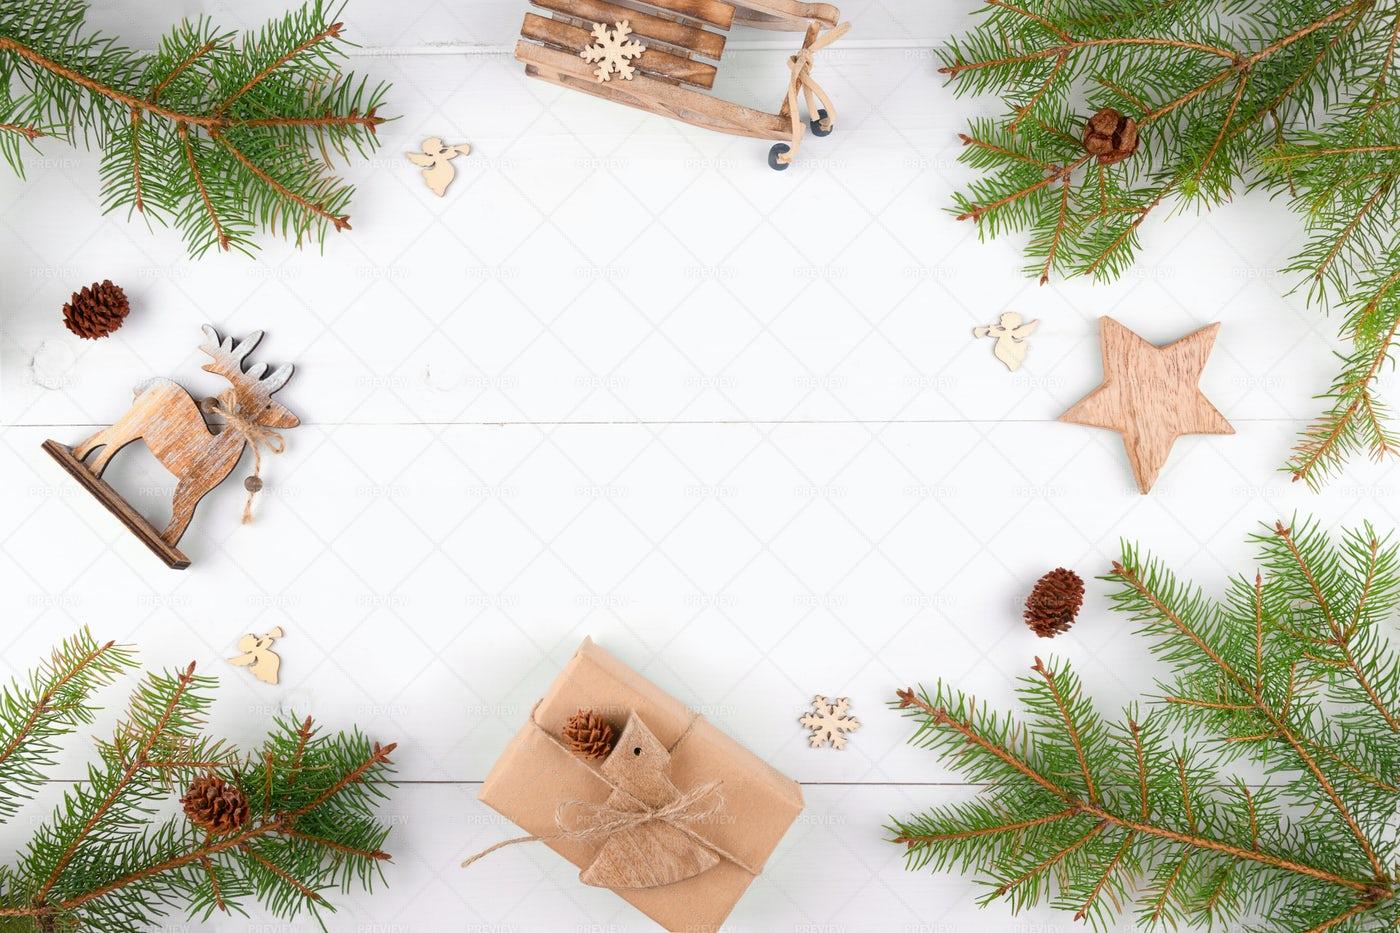 Christmas Frame Of Fir Twigs: Stock Photos